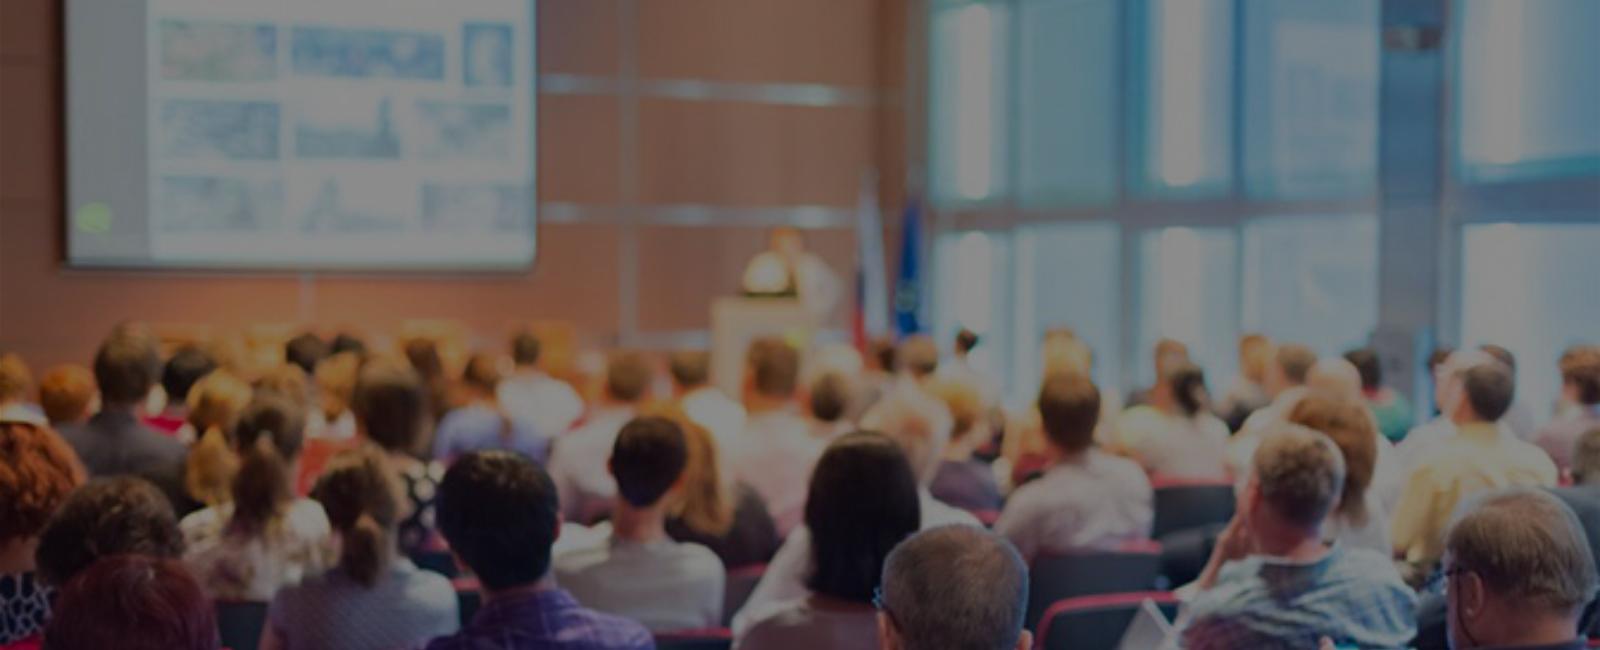 O&A Mgt - Event Management